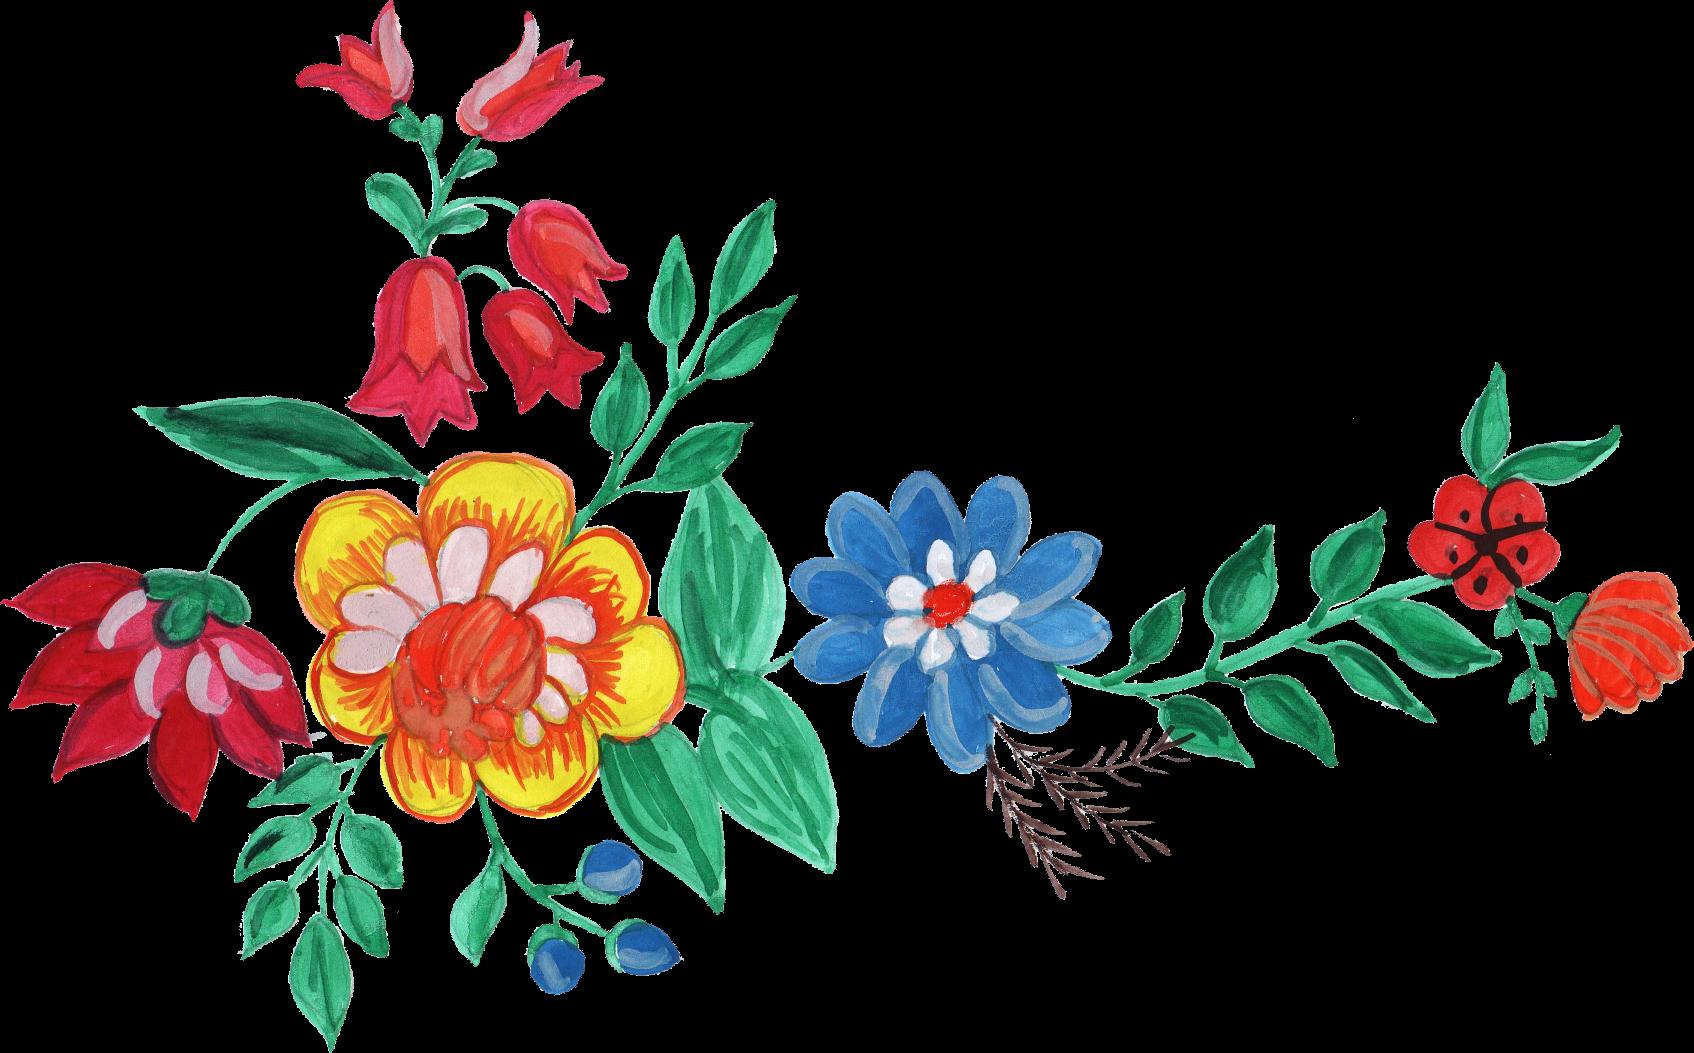 flower corner png. Floral clipart watercolor